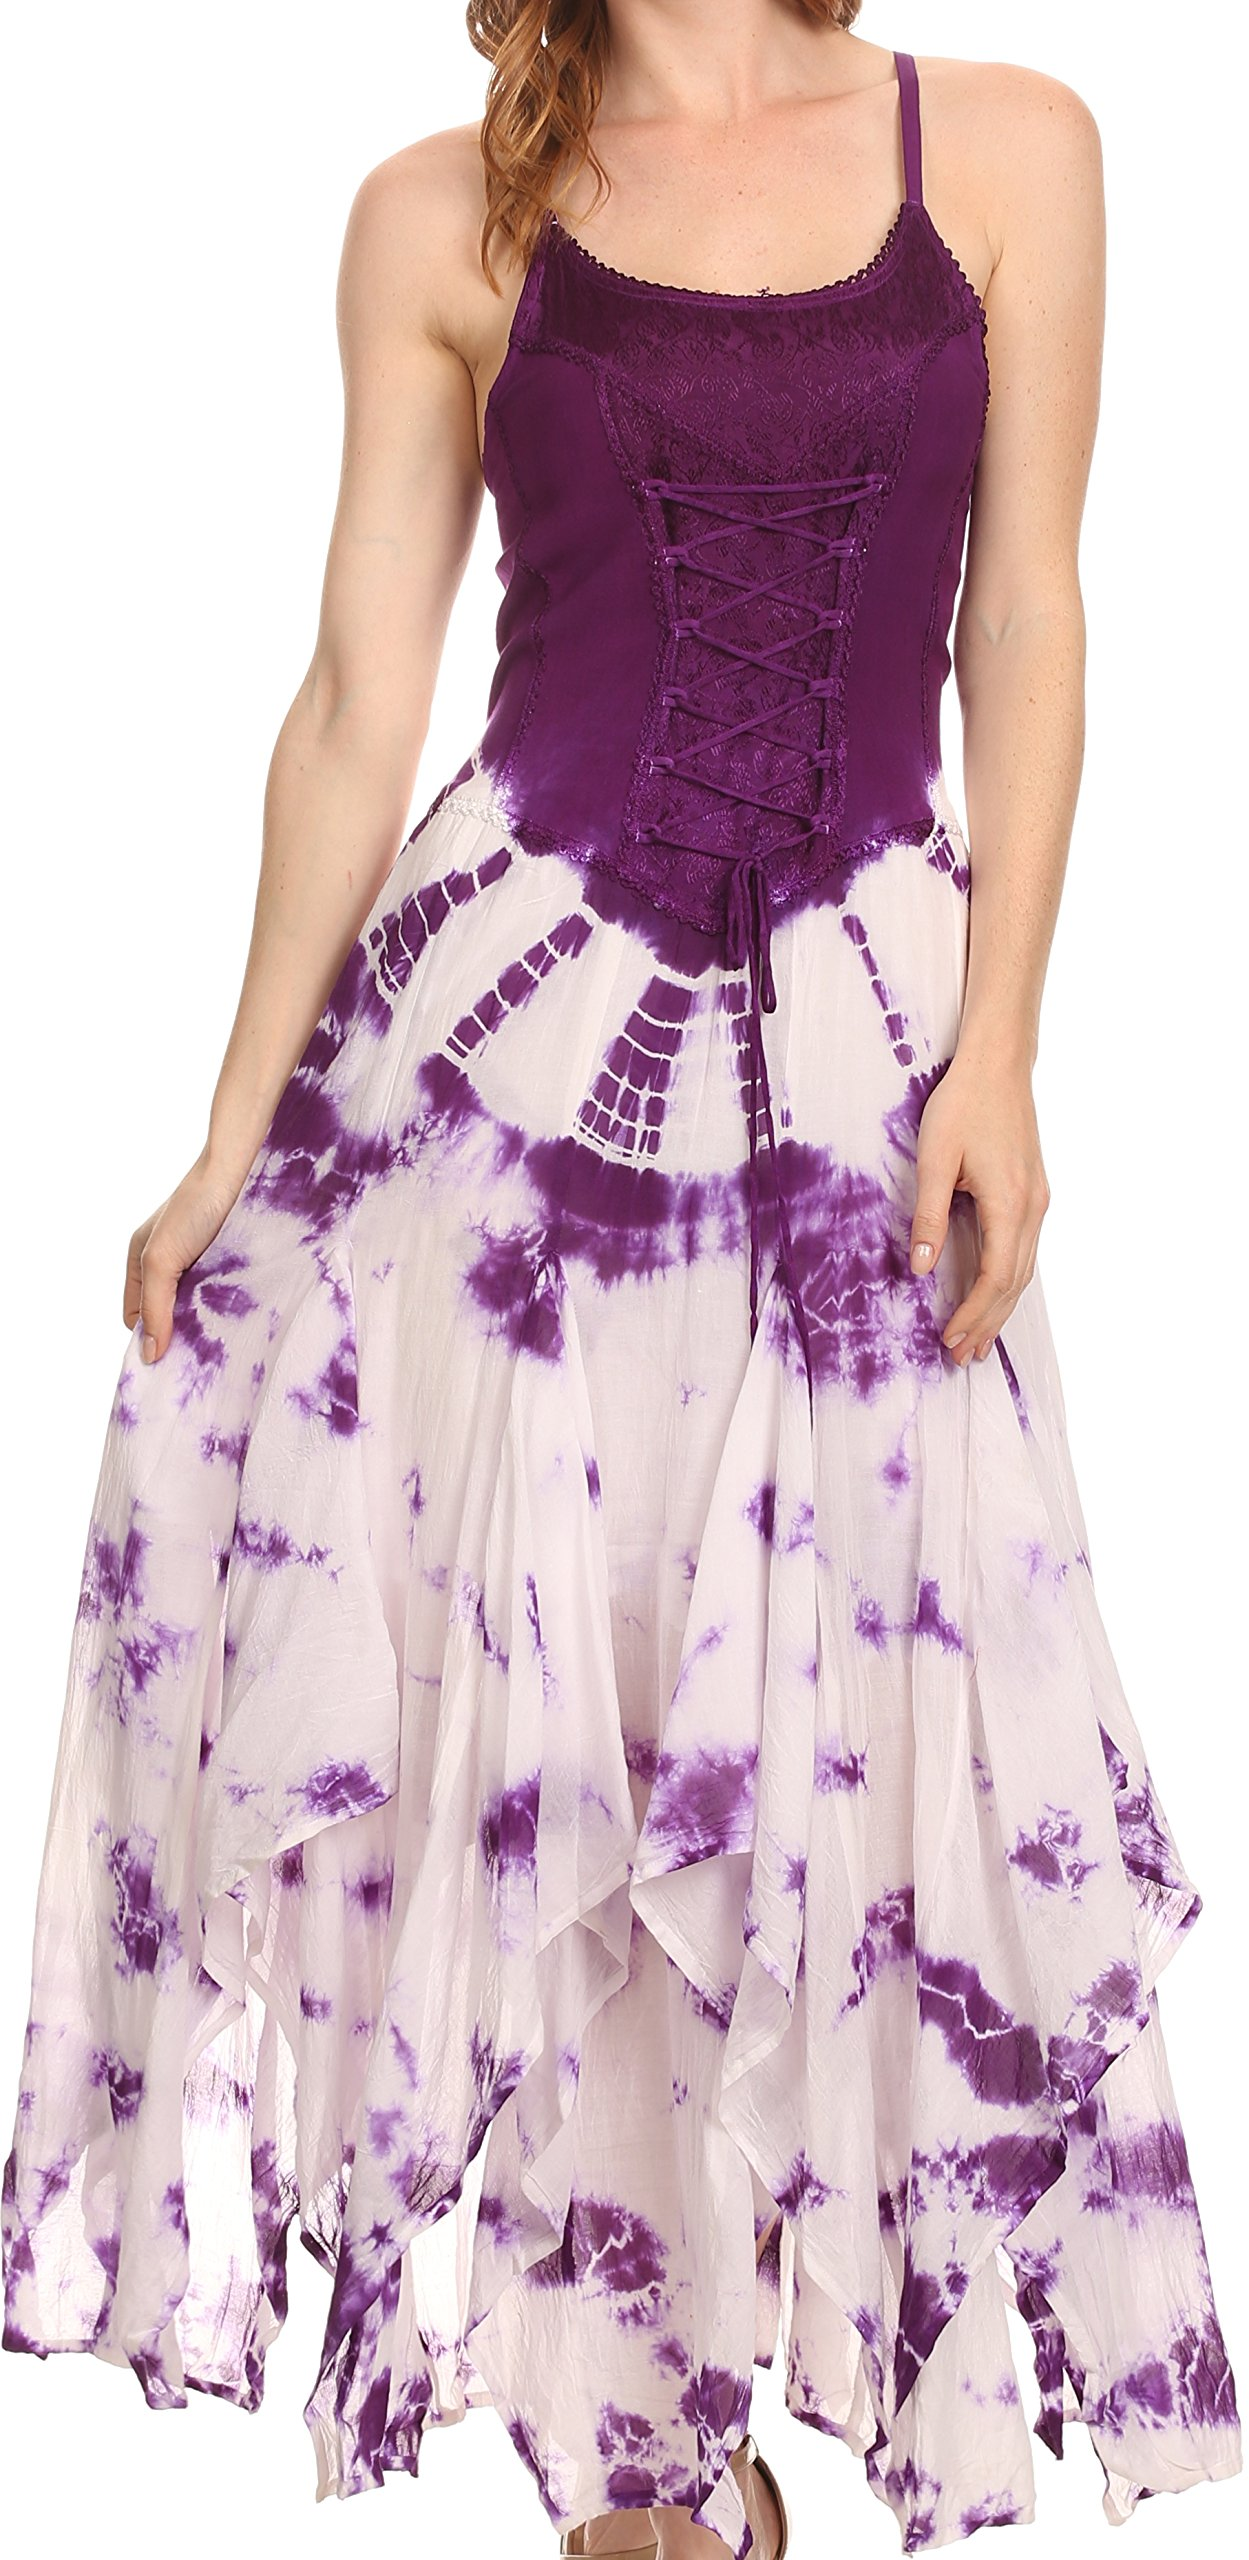 Sakkas 16209 - Sami Long Sleeveless Spaghetti Strap Handkerchief Hem Dress With Corset Top - Purple - OSP